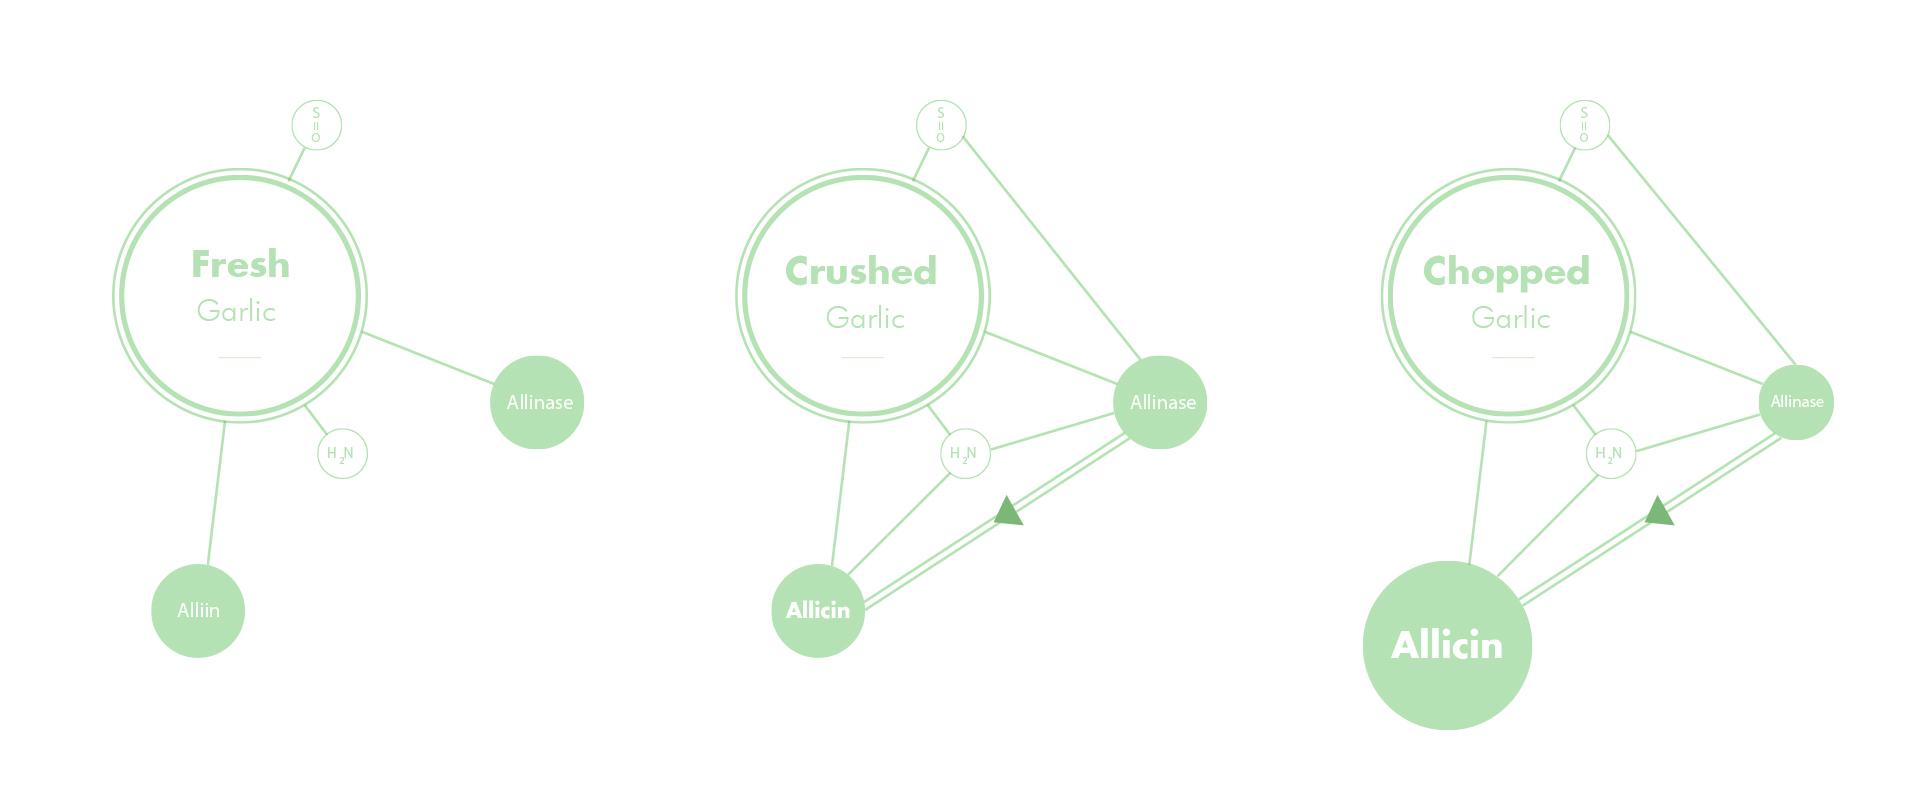 Zeal Garlic press | Diagram explaining Allicin produced to flavour garlic